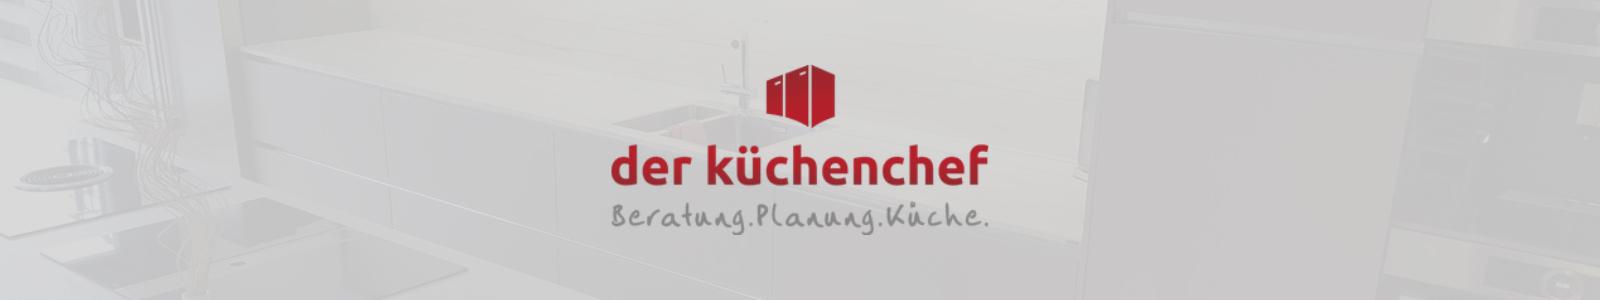 Der KüchenChef Zöllnitz / Jena kuechenguide.com